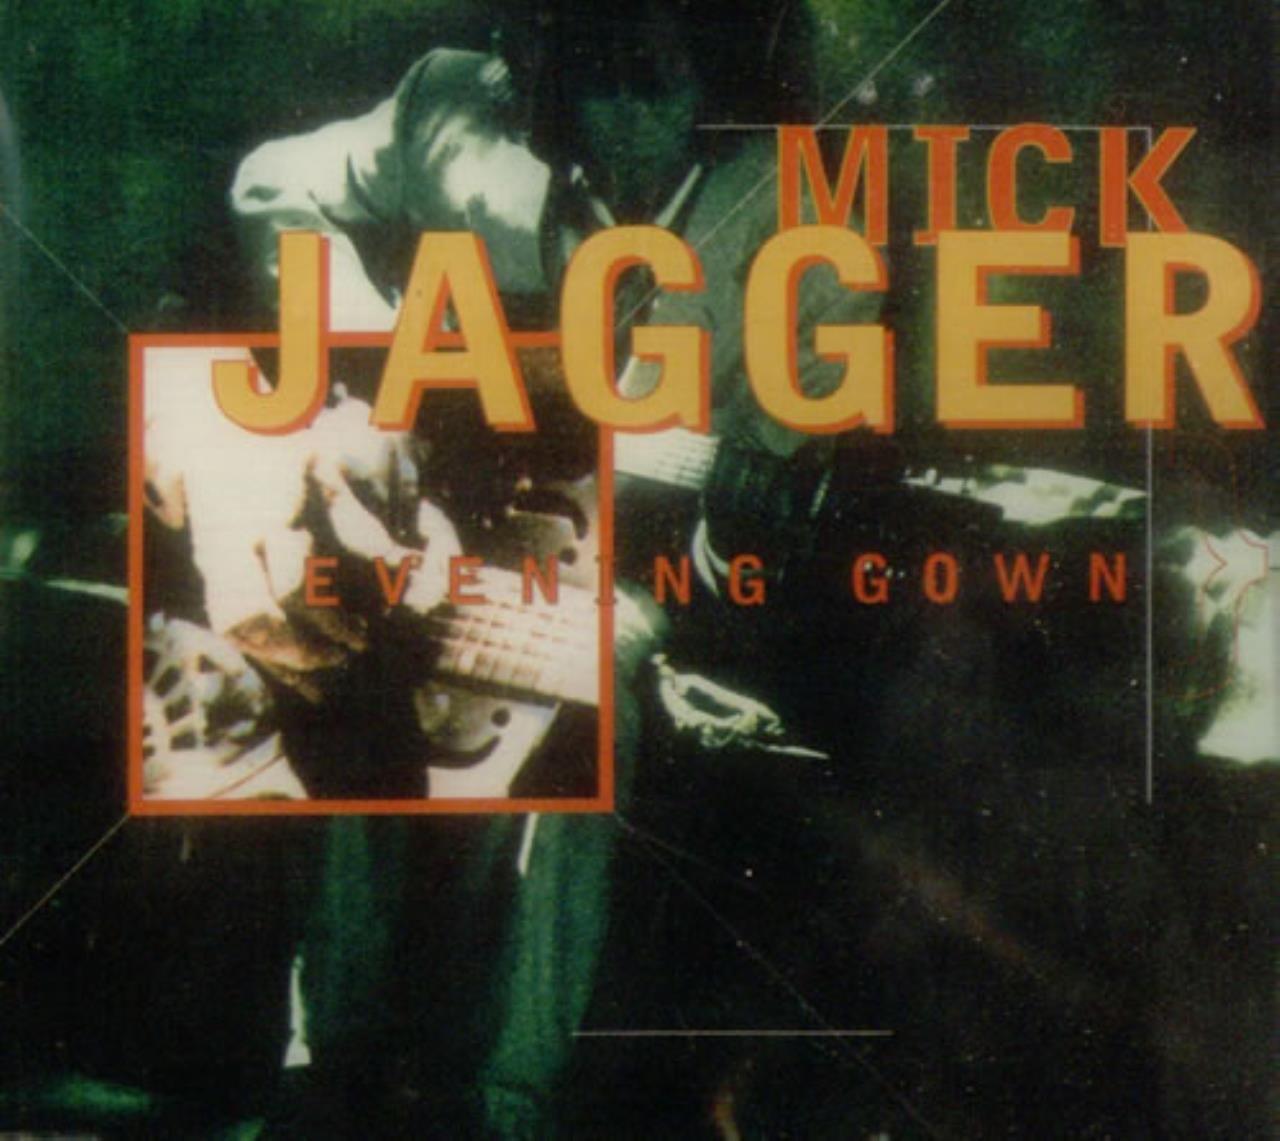 Mick Jagger - Evening gown, MICK JAGGER 3track CD - Amazon.com Music